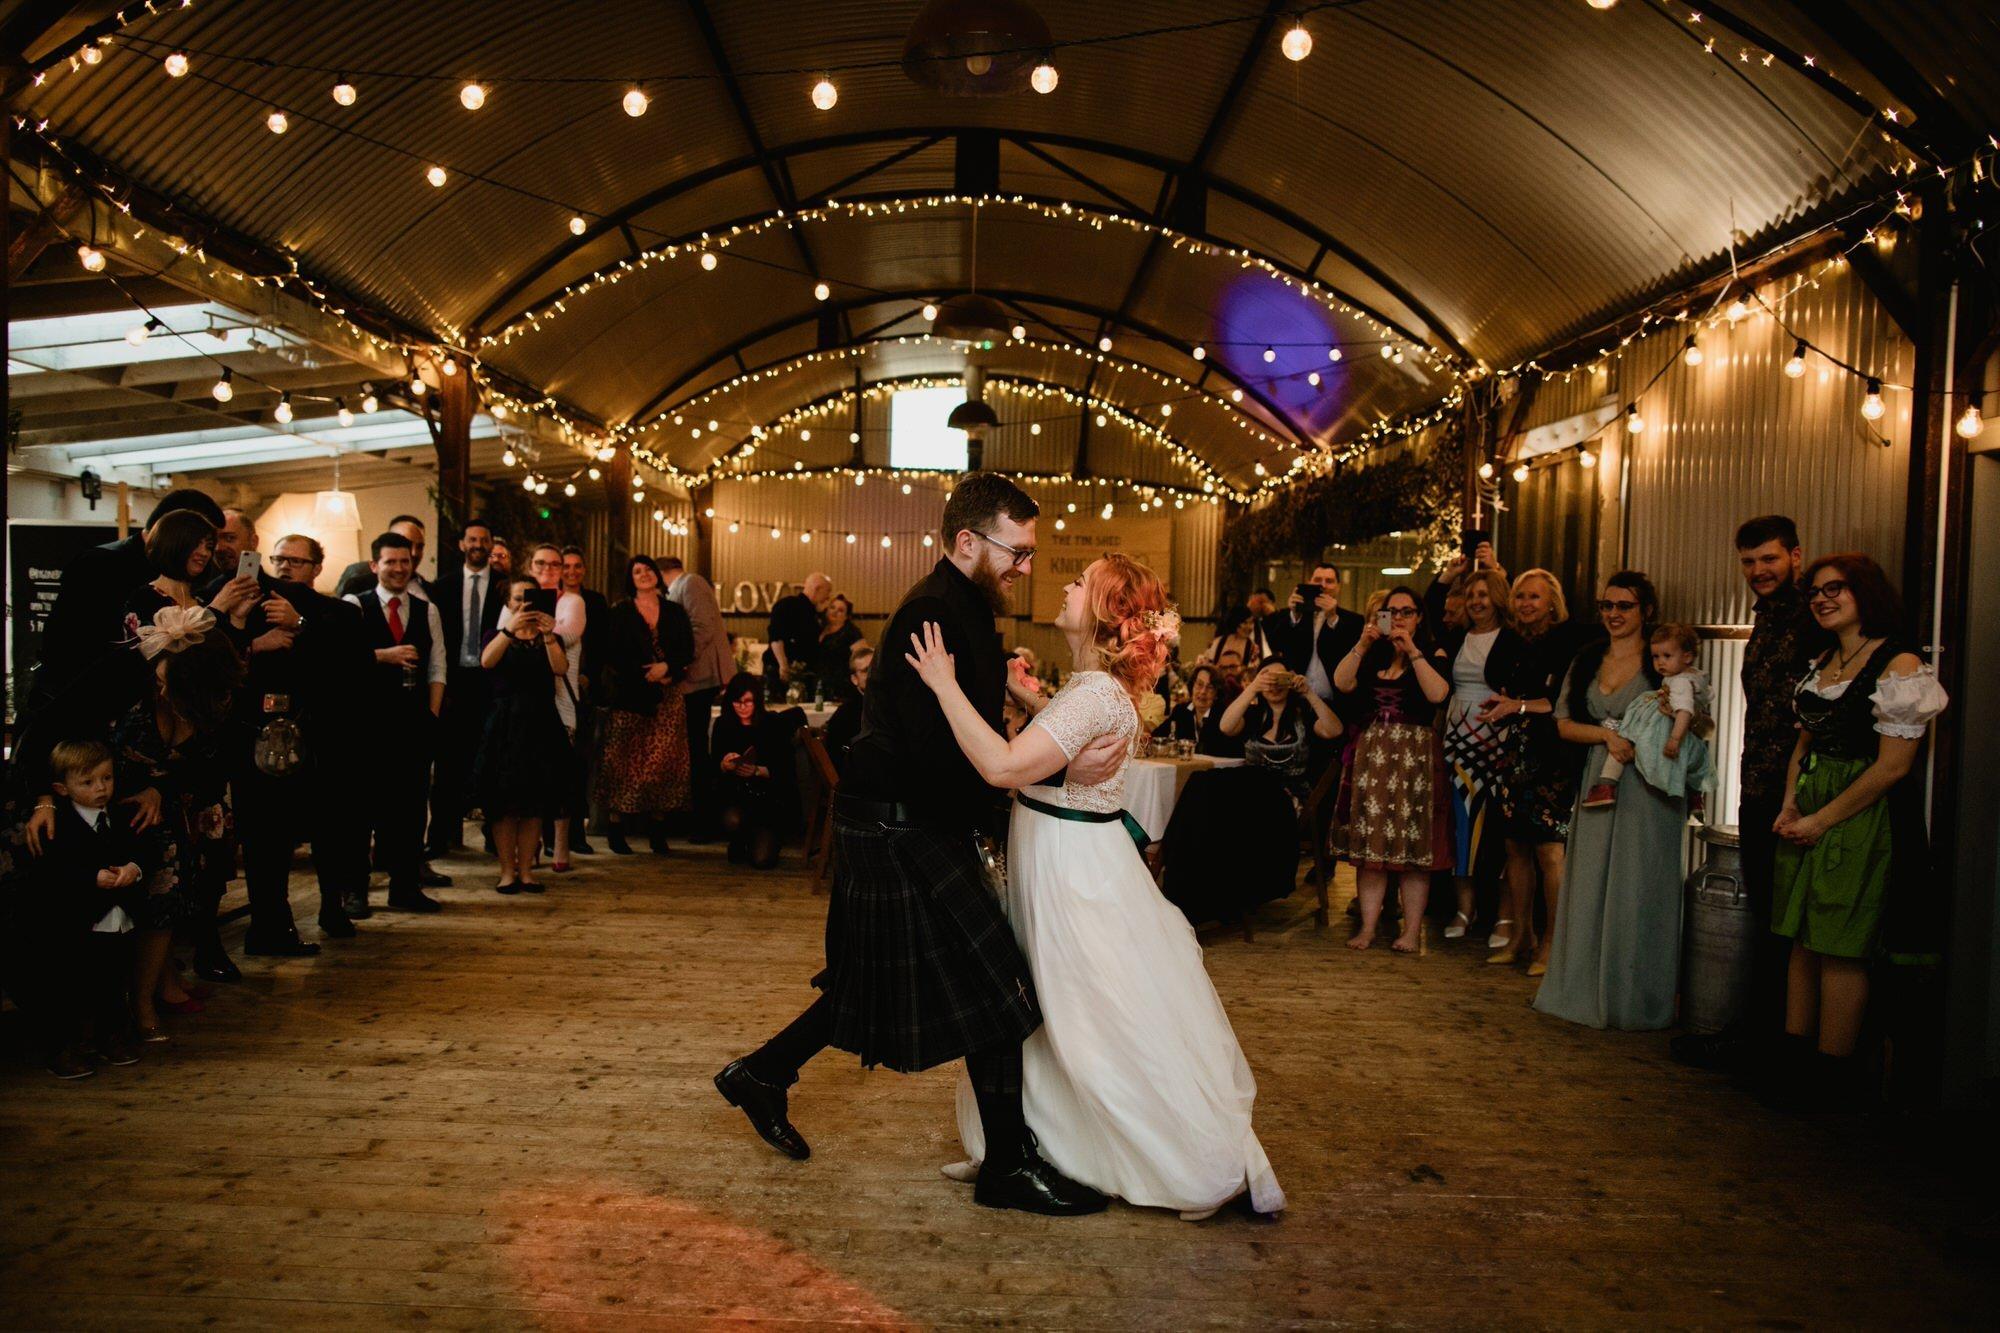 060 FIRST DANCE TIN SHED KNOCKRAICH WEDDING AUSTRIAN SCOTTISH ZOE ALEXANDRA PHOTOGRAPHY